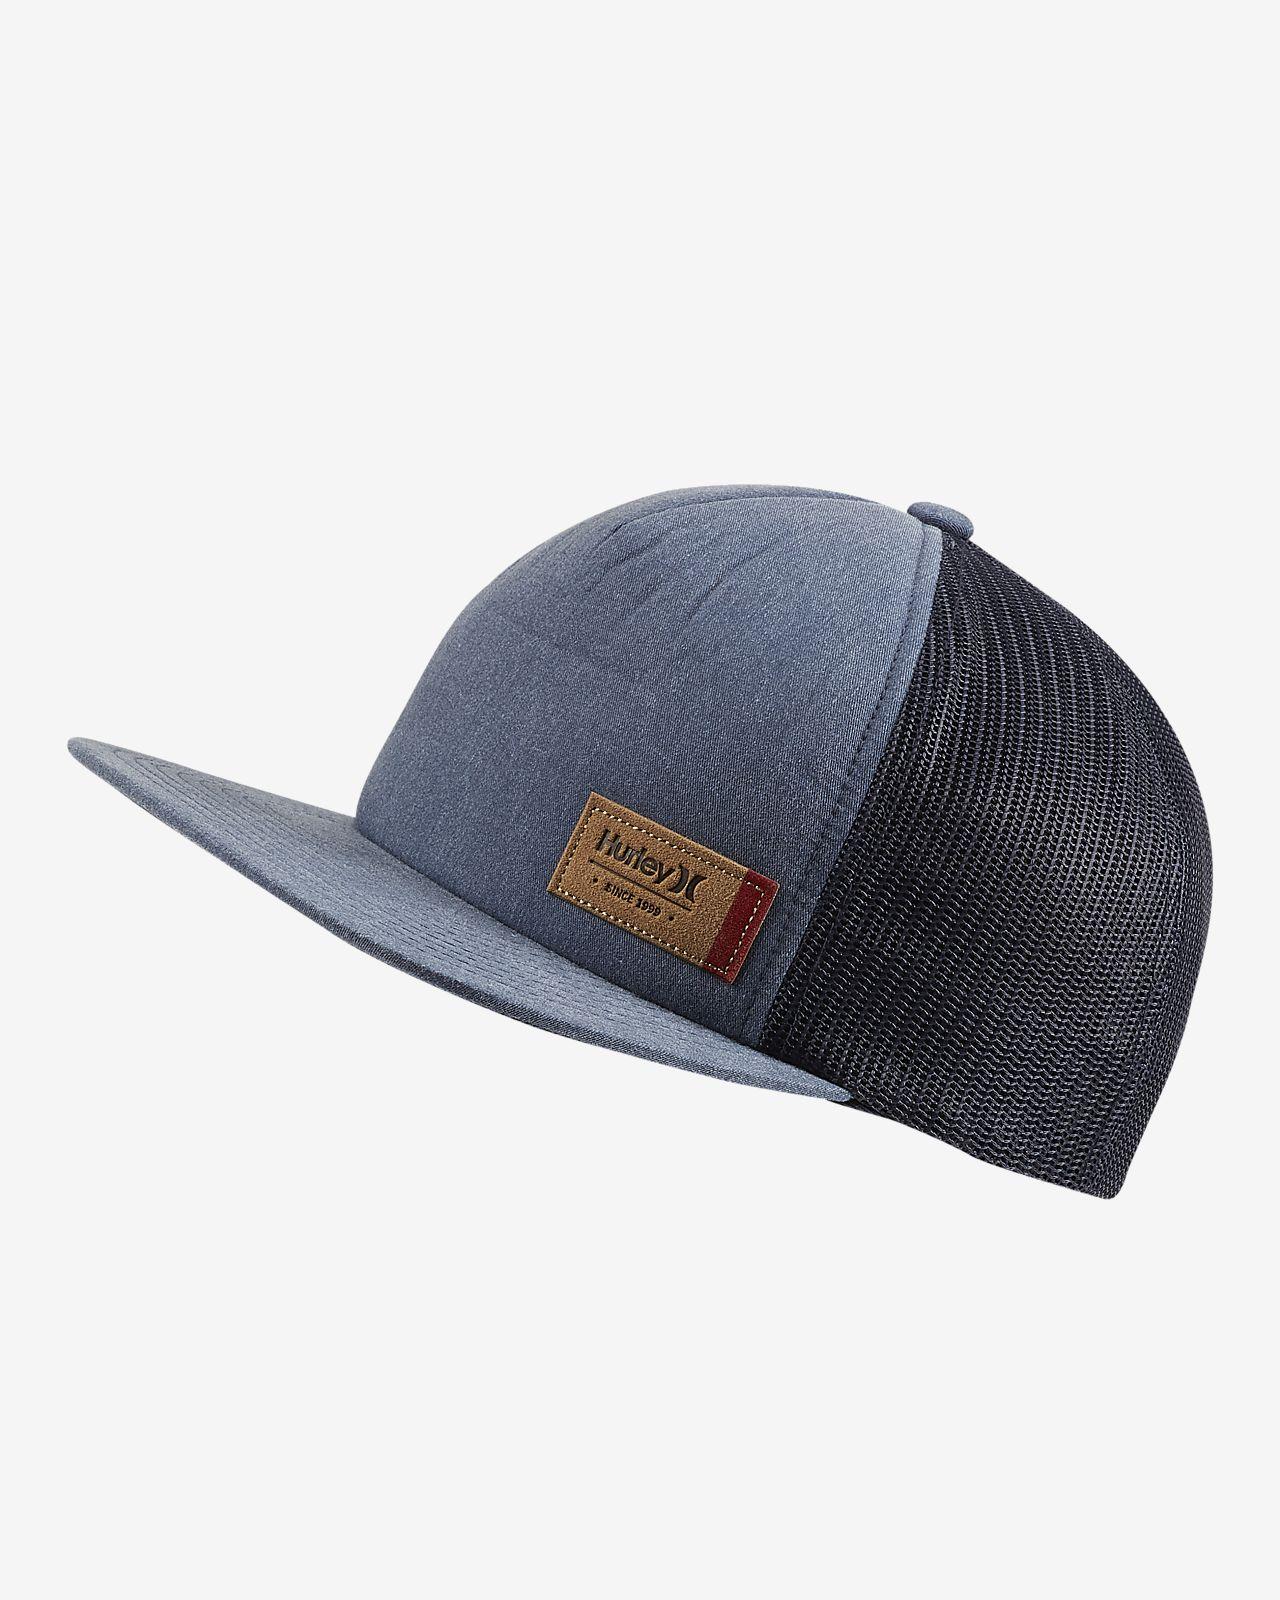 Hurley Cardiff Men's Hat